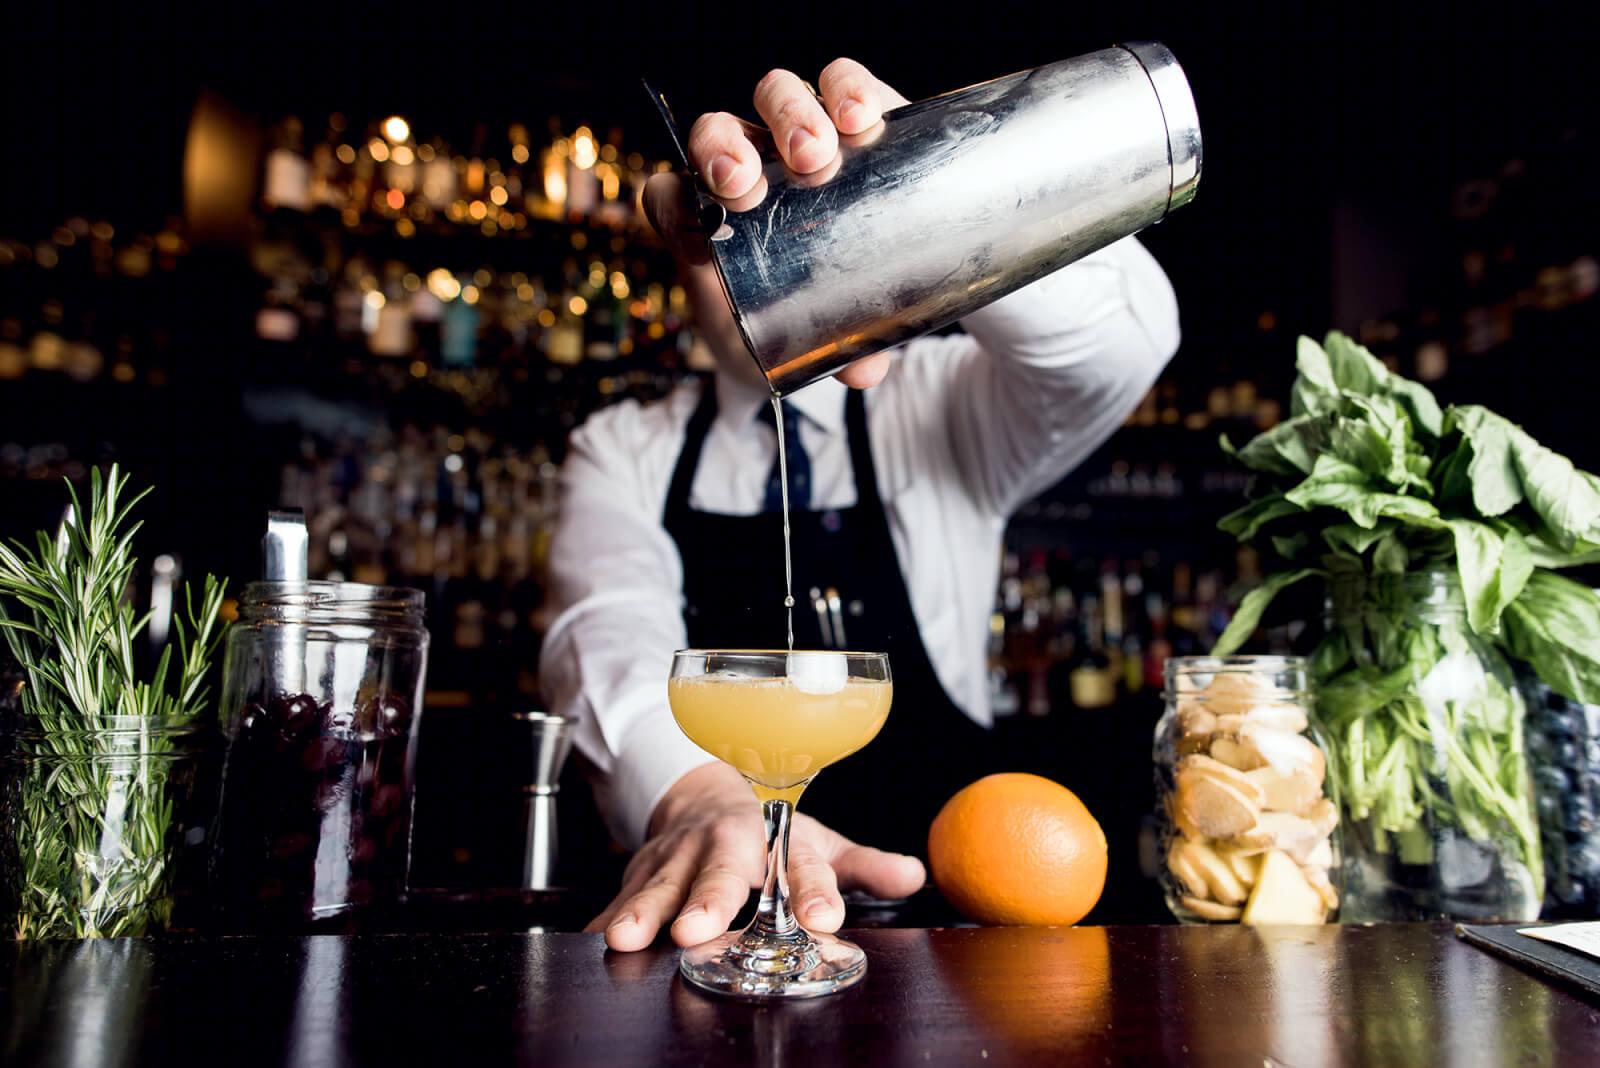 Sip & Bite: Crafty Drinks<br>& Good Eats in St. John's - image